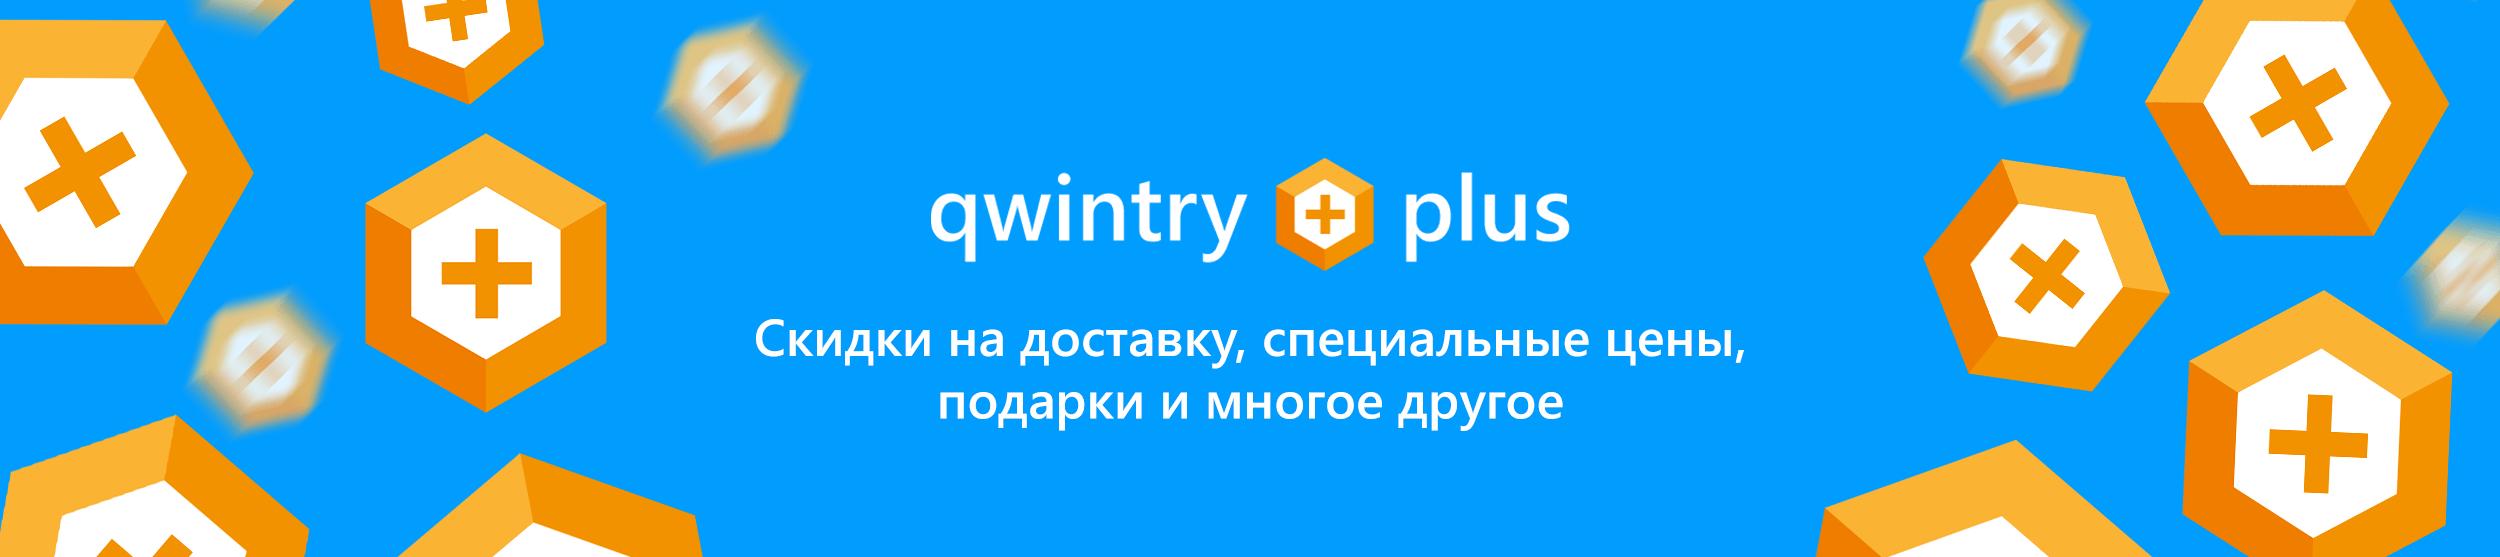 Qwintry plus - скоро!